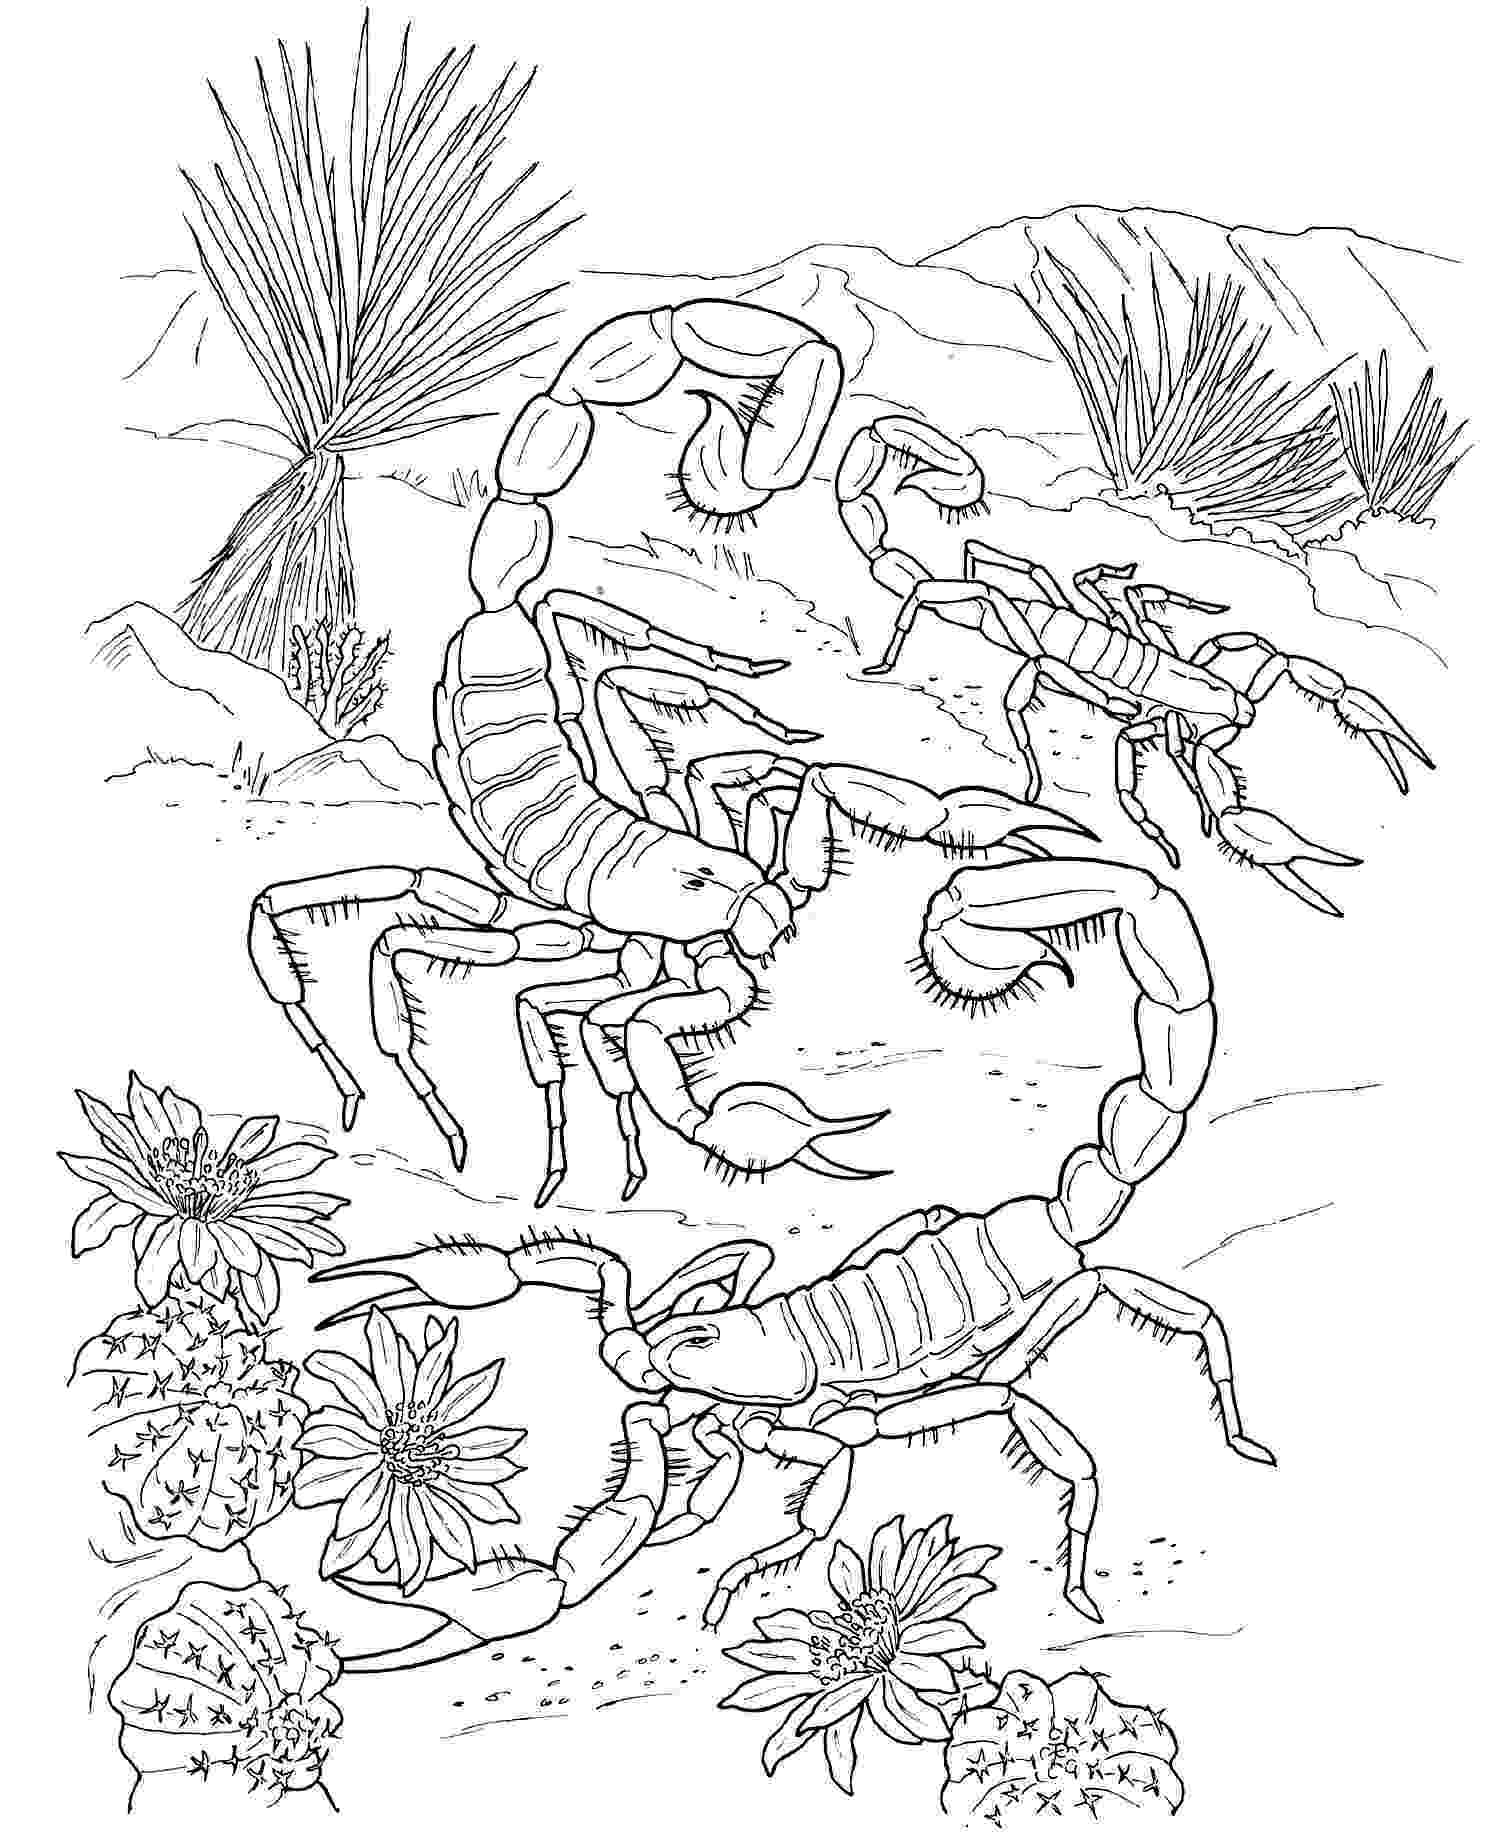 desert plants coloring pages desert animals coloring page pages plants coloring desert